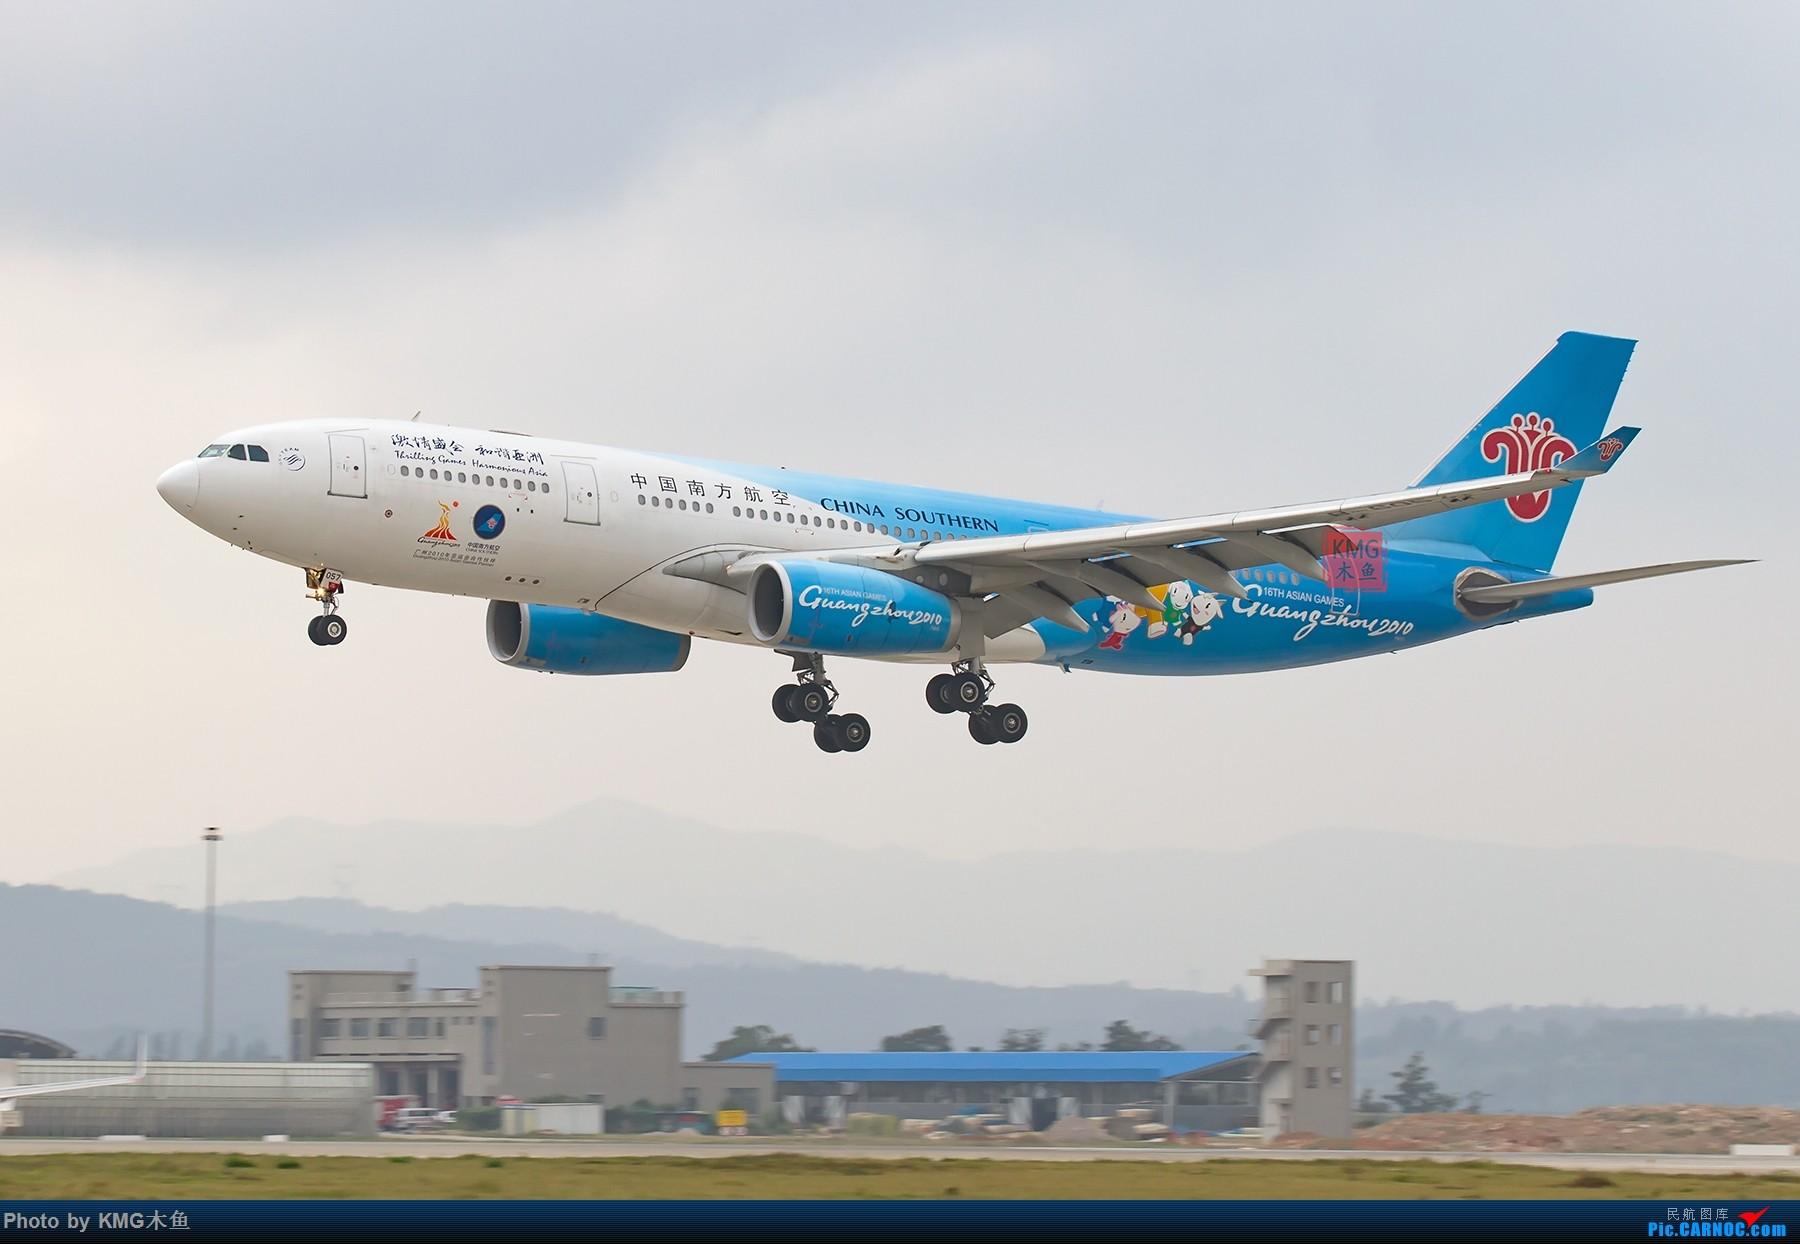 Re:[原创]【昆明长水国际机场—KMG木鱼10.16日拍机】周末拍机,有宽体,有彩绘,少了小伙伴们,独自一人拍机 AIRBUS A330-200 B-6057 中国昆明长水国际机场